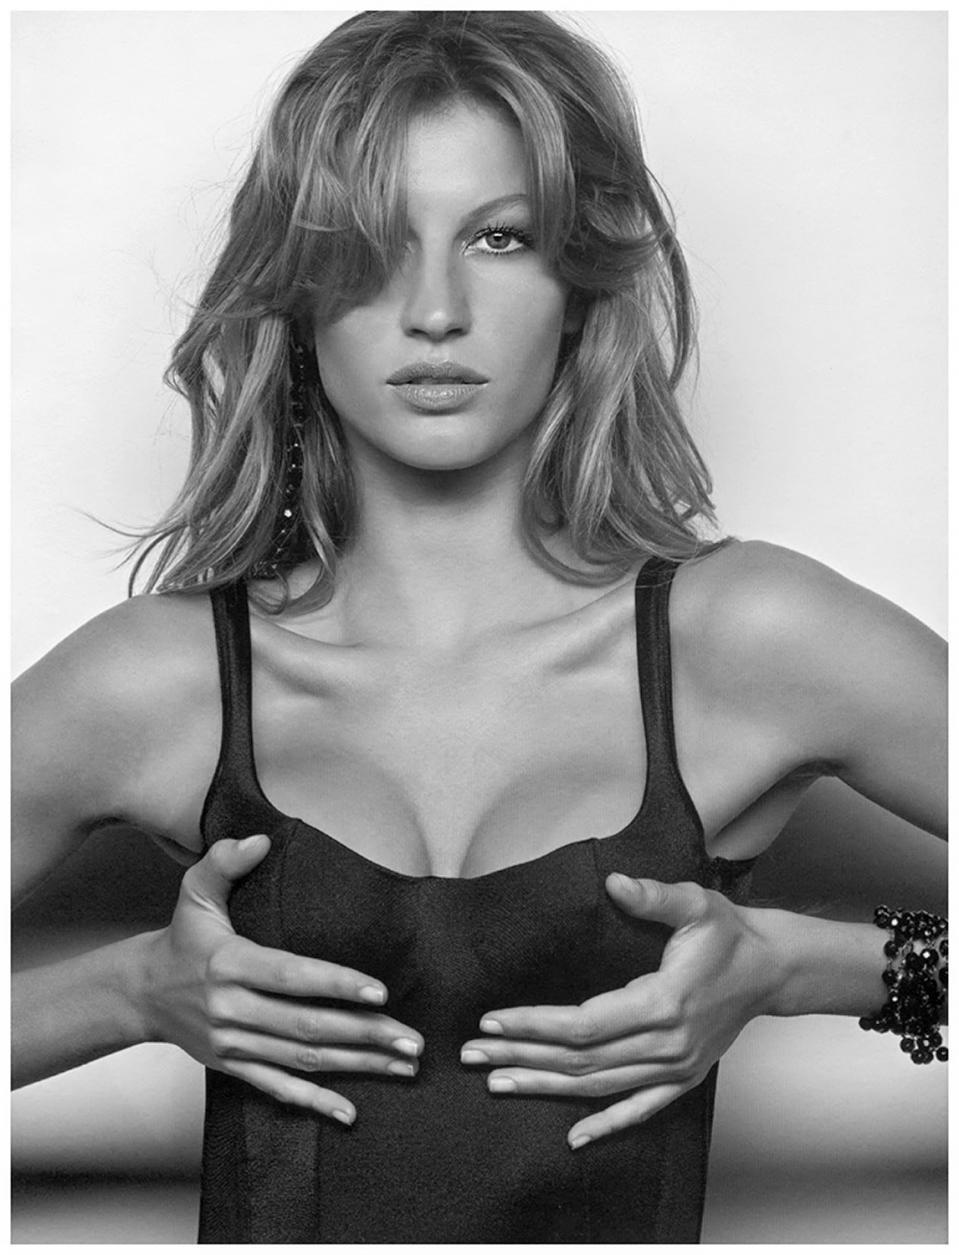 Gisele Bundchen sexy fashion model